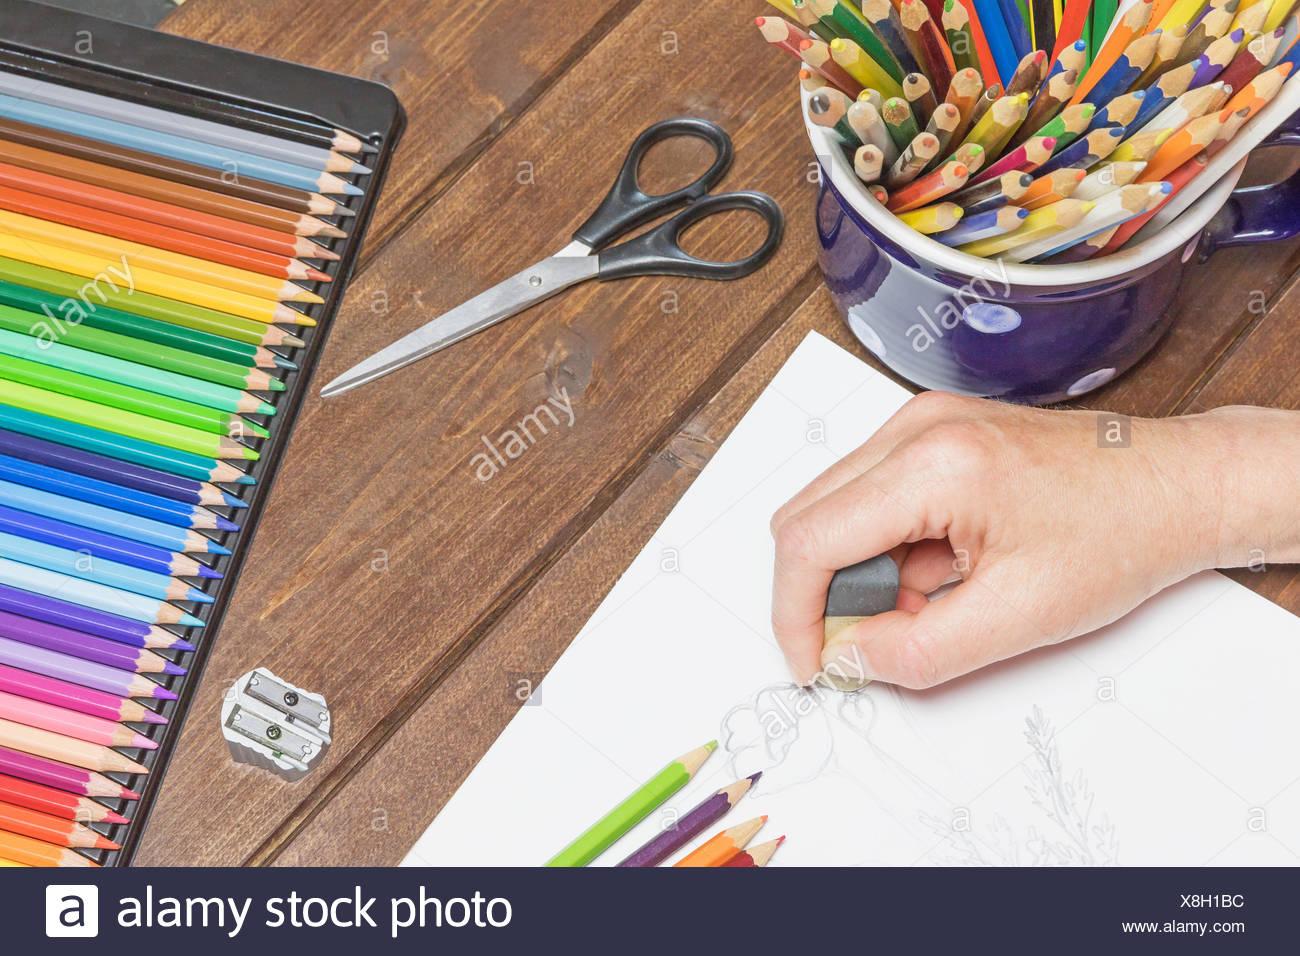 Drawing Of Flowers Stockfotos & Drawing Of Flowers Bilder - Alamy